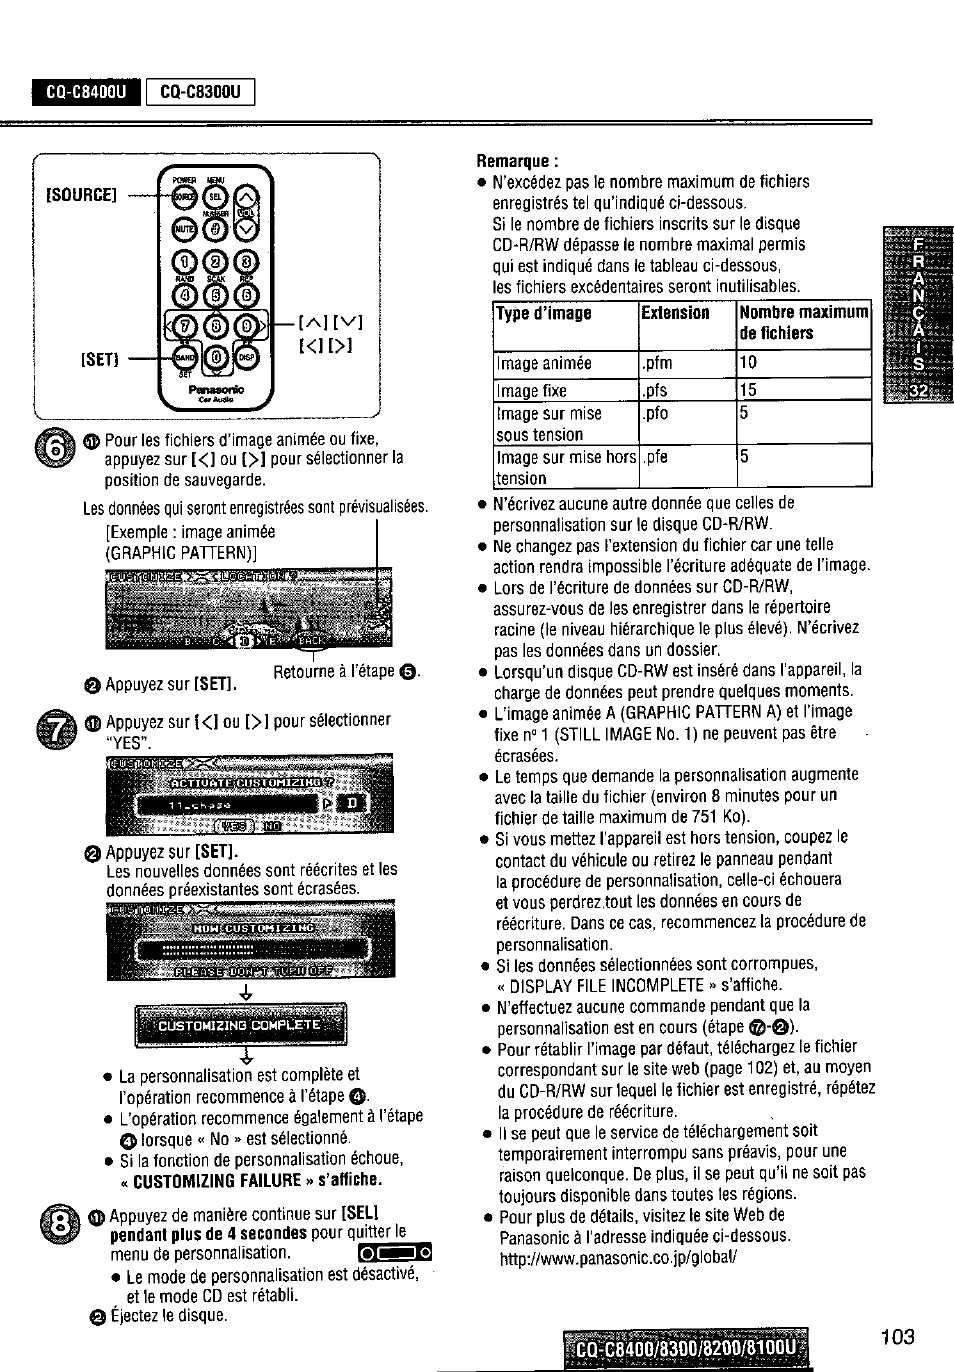 Panasonic cq c8400u wiring diagram wiring diagram cq c8400u remarque p1 e panasonic cq c8300u user manual page rh manualsdir com radio wiring harness diagram panasonic car stereo socket schematic cheapraybanclubmaster Images